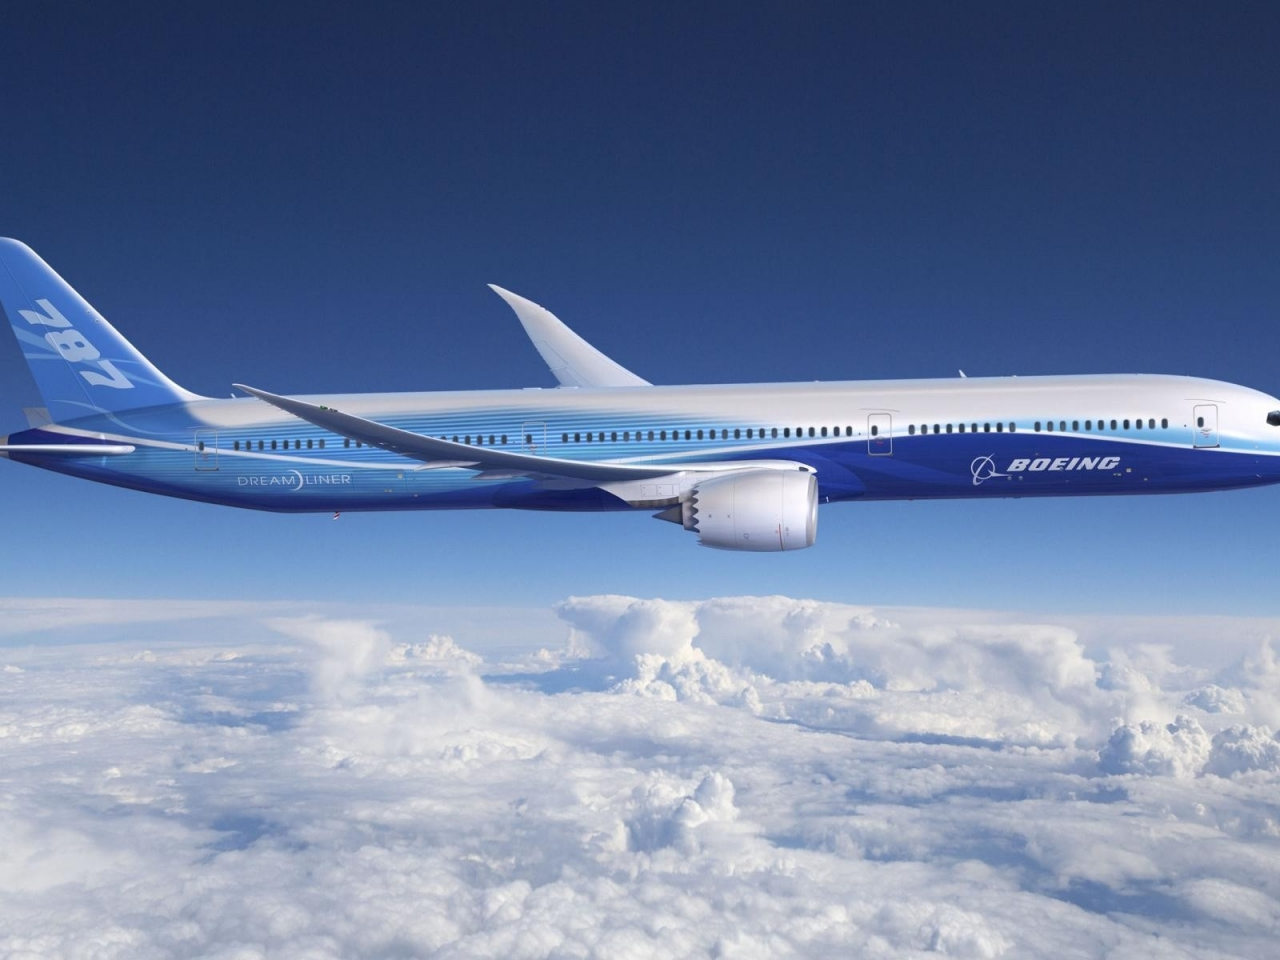 Boeing 787 Dreamliner - 1280x960